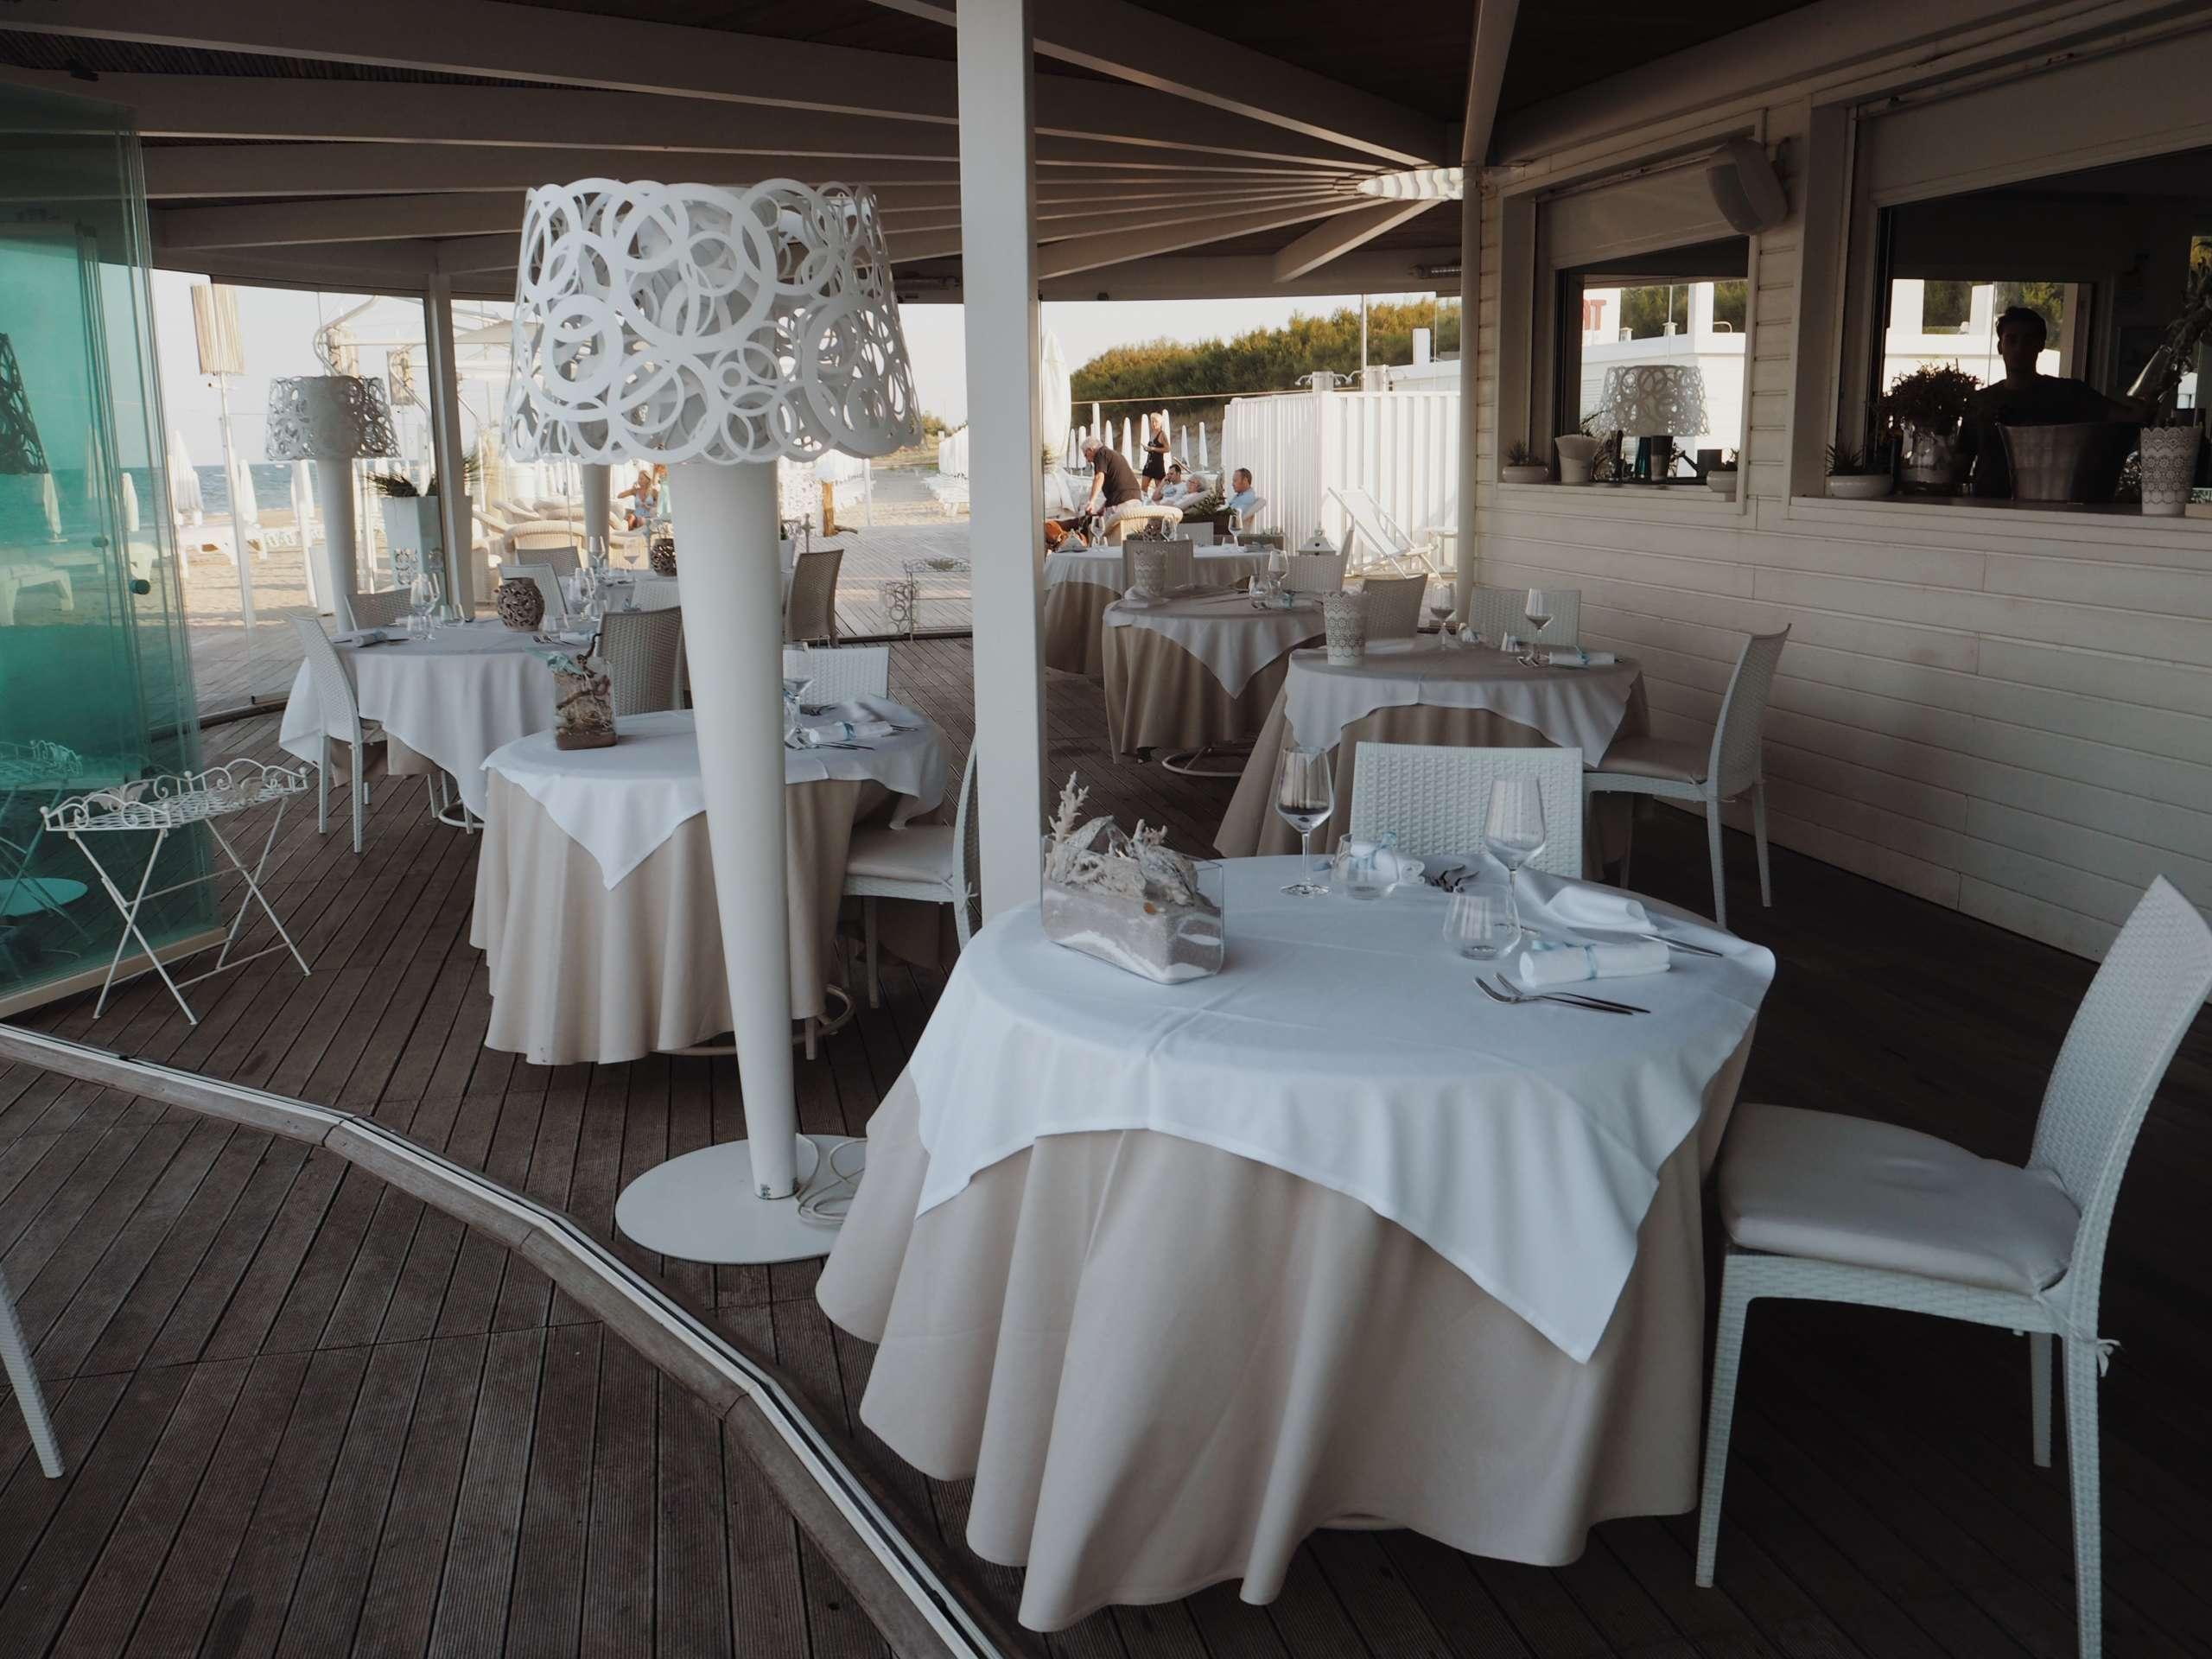 beach-club--Elliot-Mann-Italy-laura-gravestock--nicole-vienna-otterbox-phone-case-summer--Ana-Alcazar-cala-celeste-lido-adriano